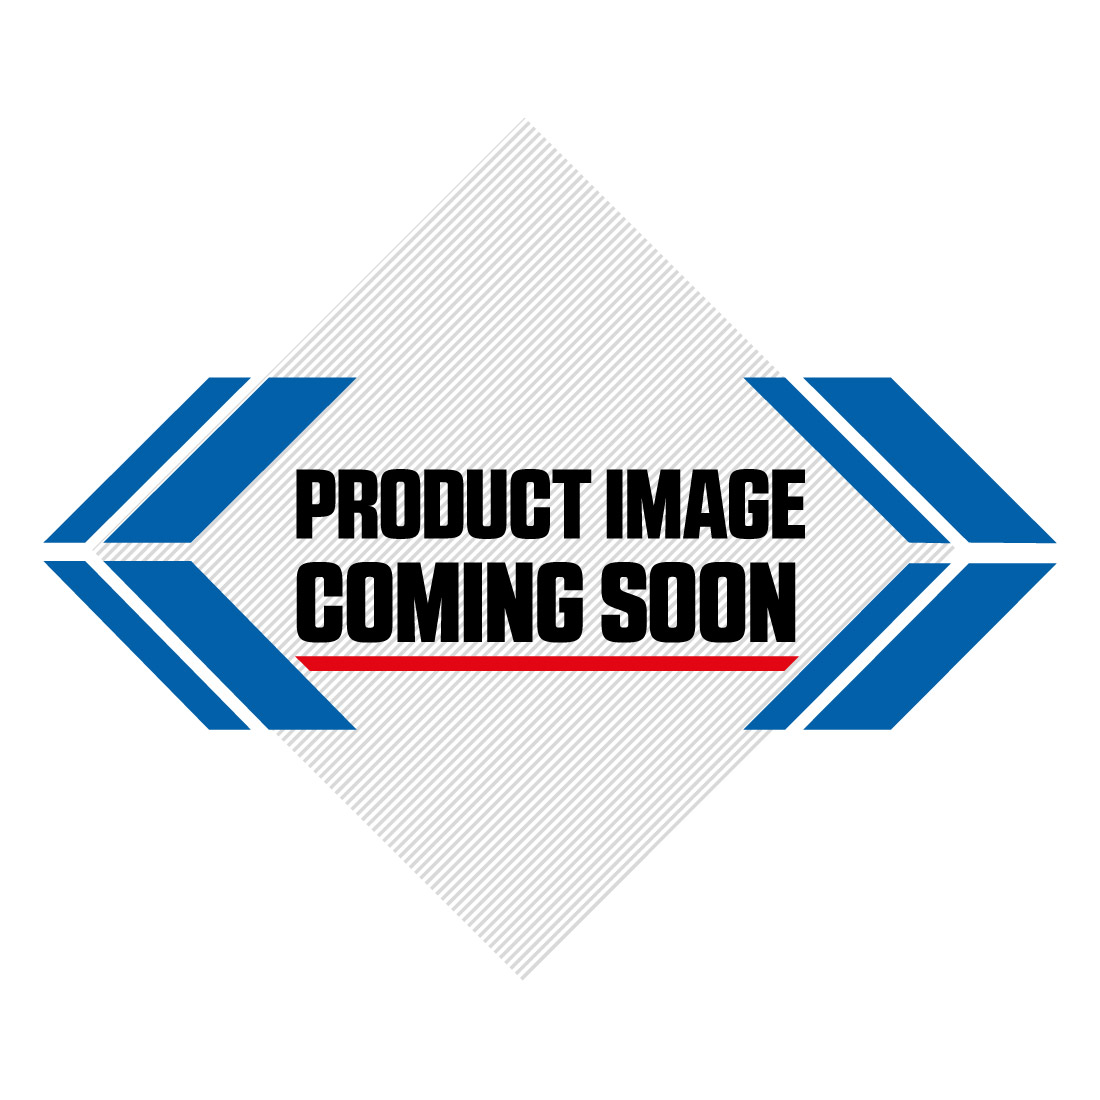 UFO KTM Plastic Kit SX 125 150 250 SXF 250 350 450 (16-18) White Image-3>